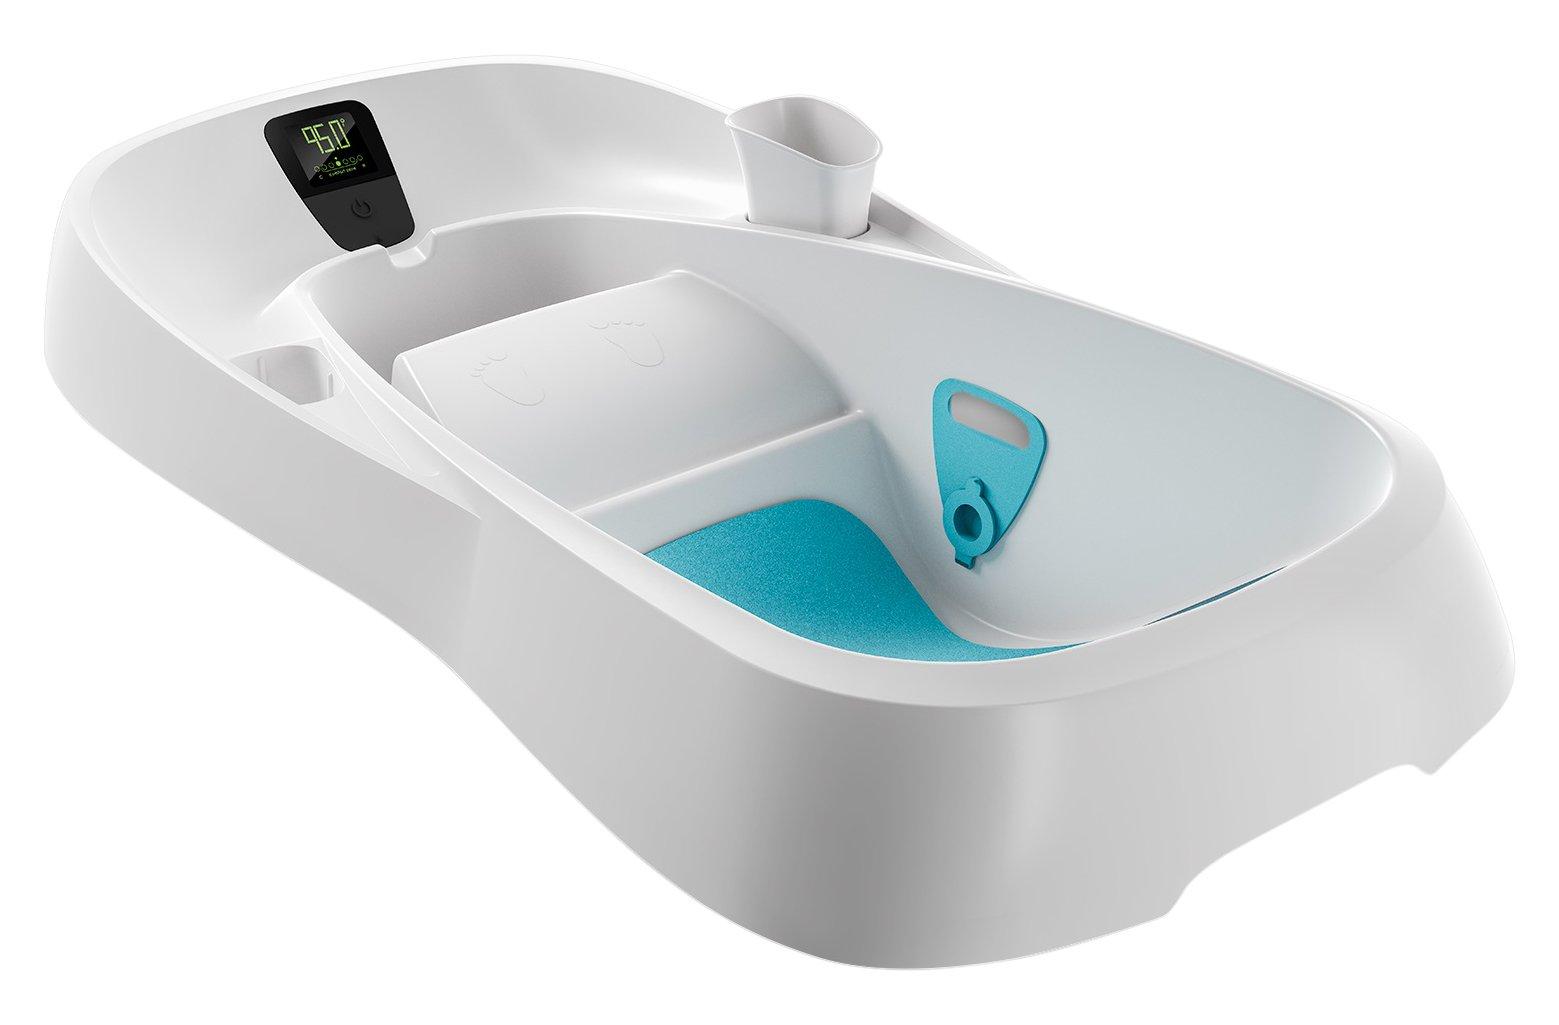 Amazon.com : Summer Infant Comfy Bath Sponge : Childrens Bathroom ...